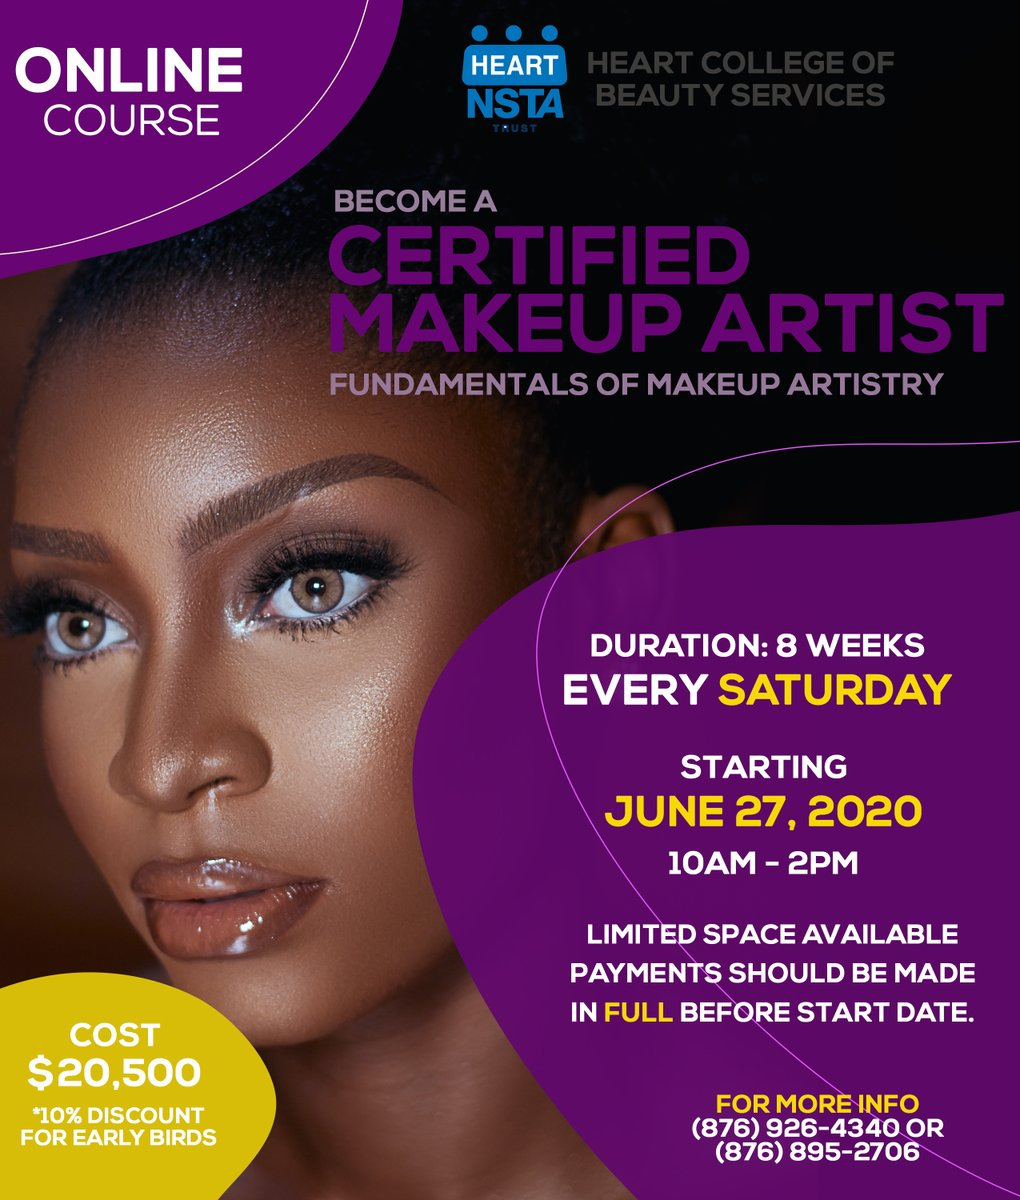 Become A Certified Makeup Artist